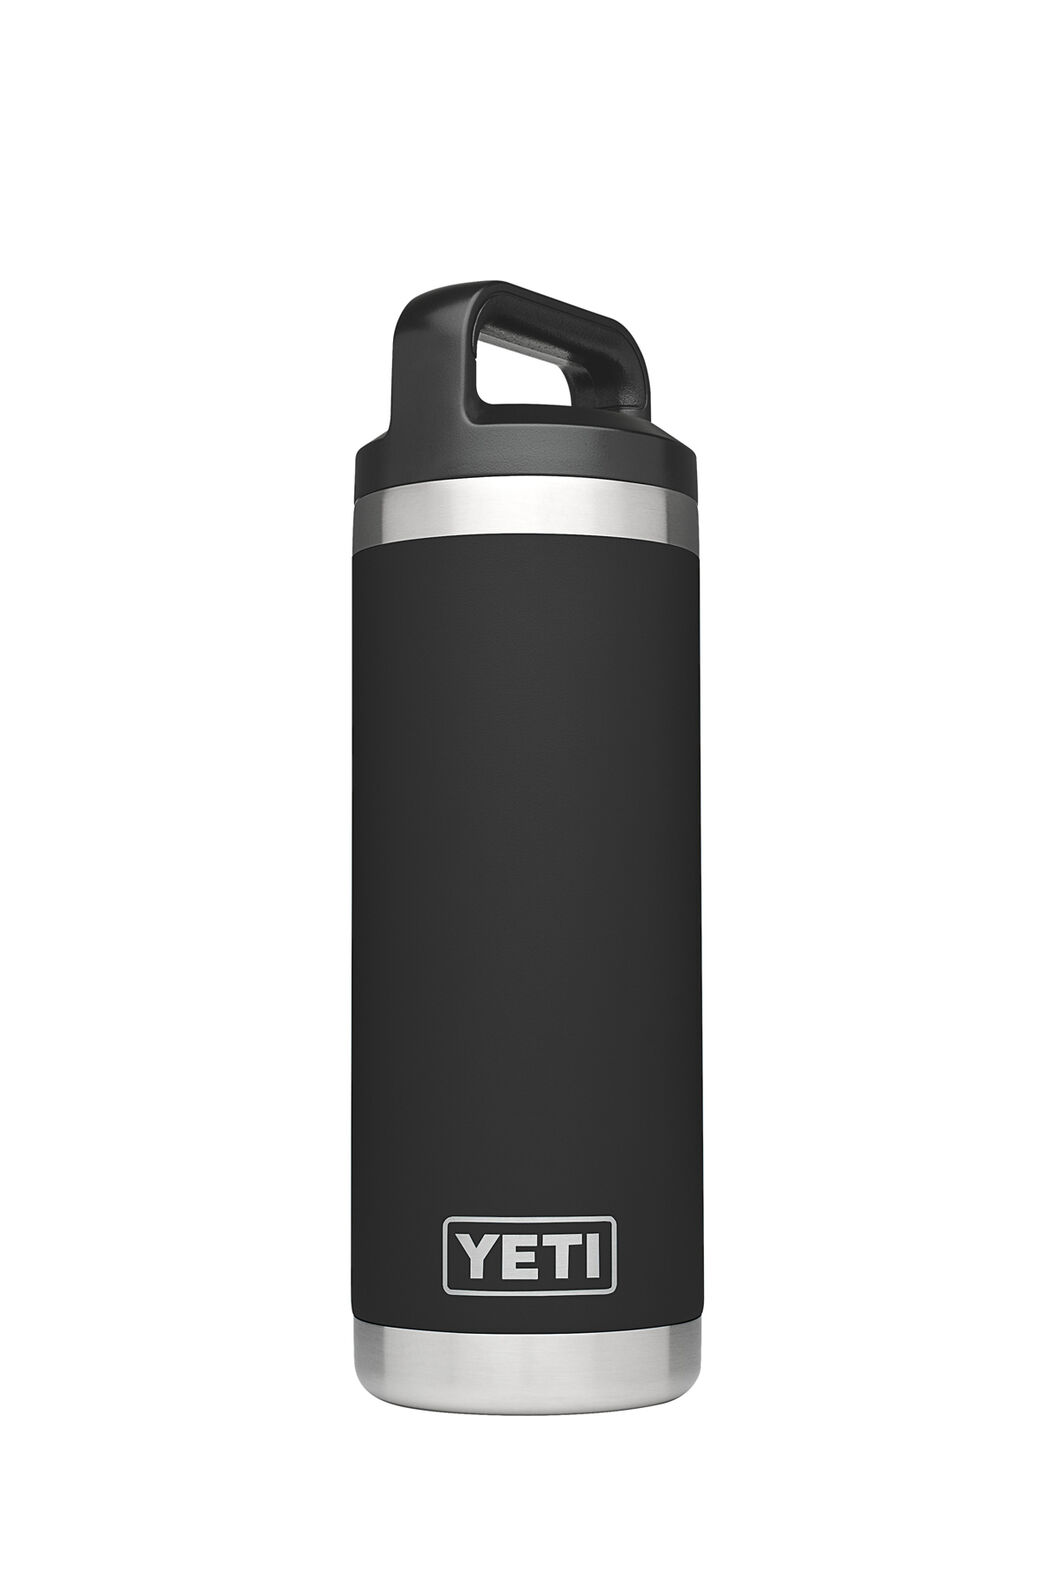 Yeti Rambler Drink Bottle Stainless Steel 18oz, Black, hi-res